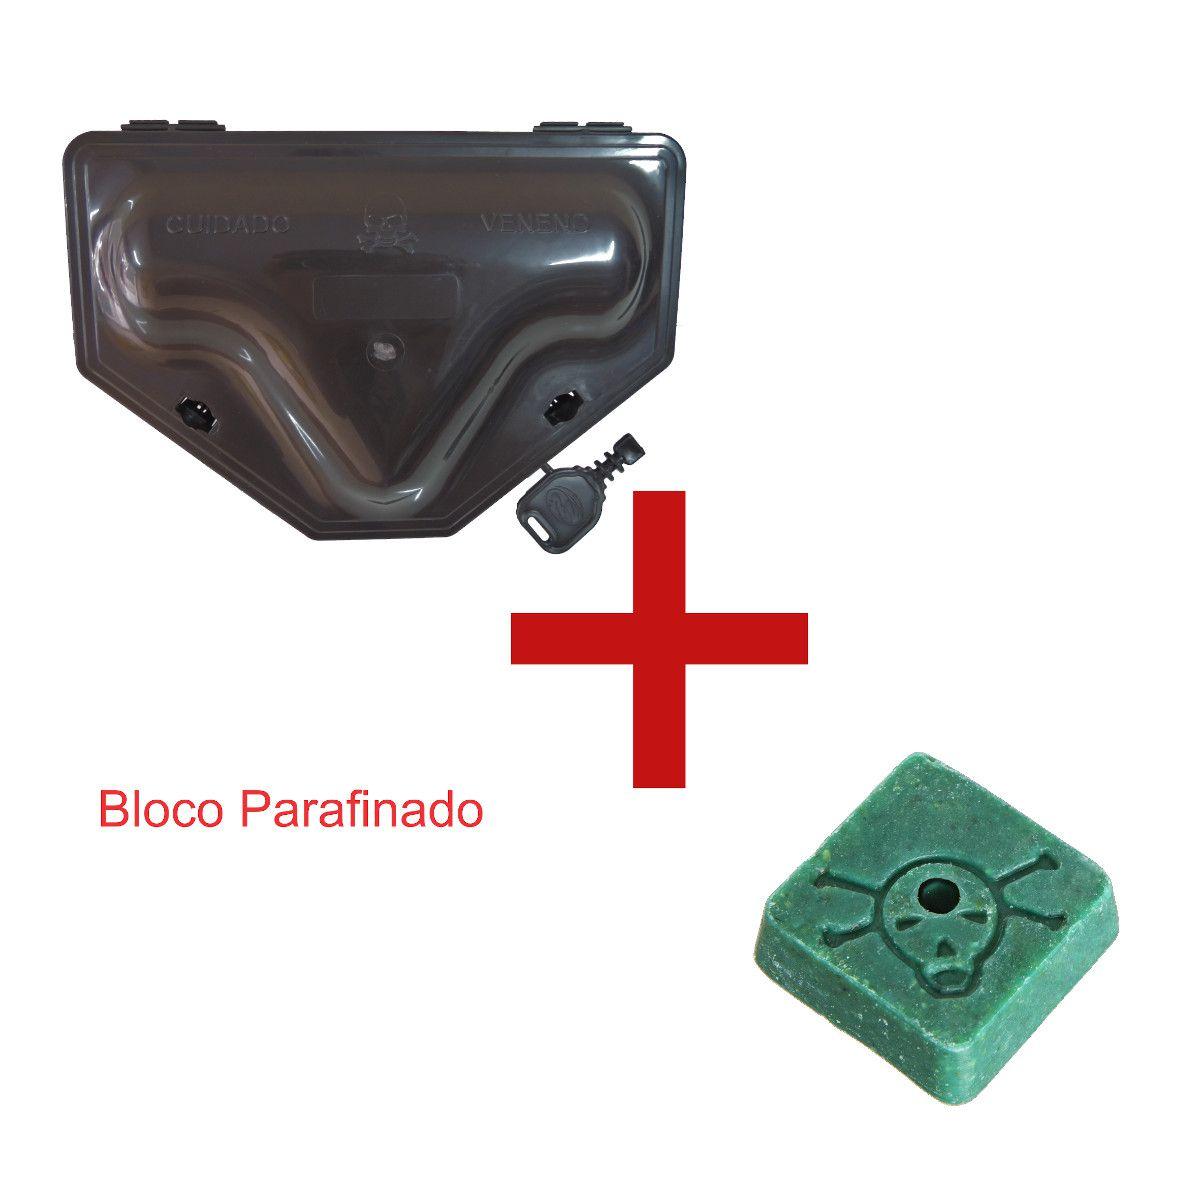 KIT 95 Porta Iscas Reforçado Ratoeira 2 TRAVAS Chave p/Ratos